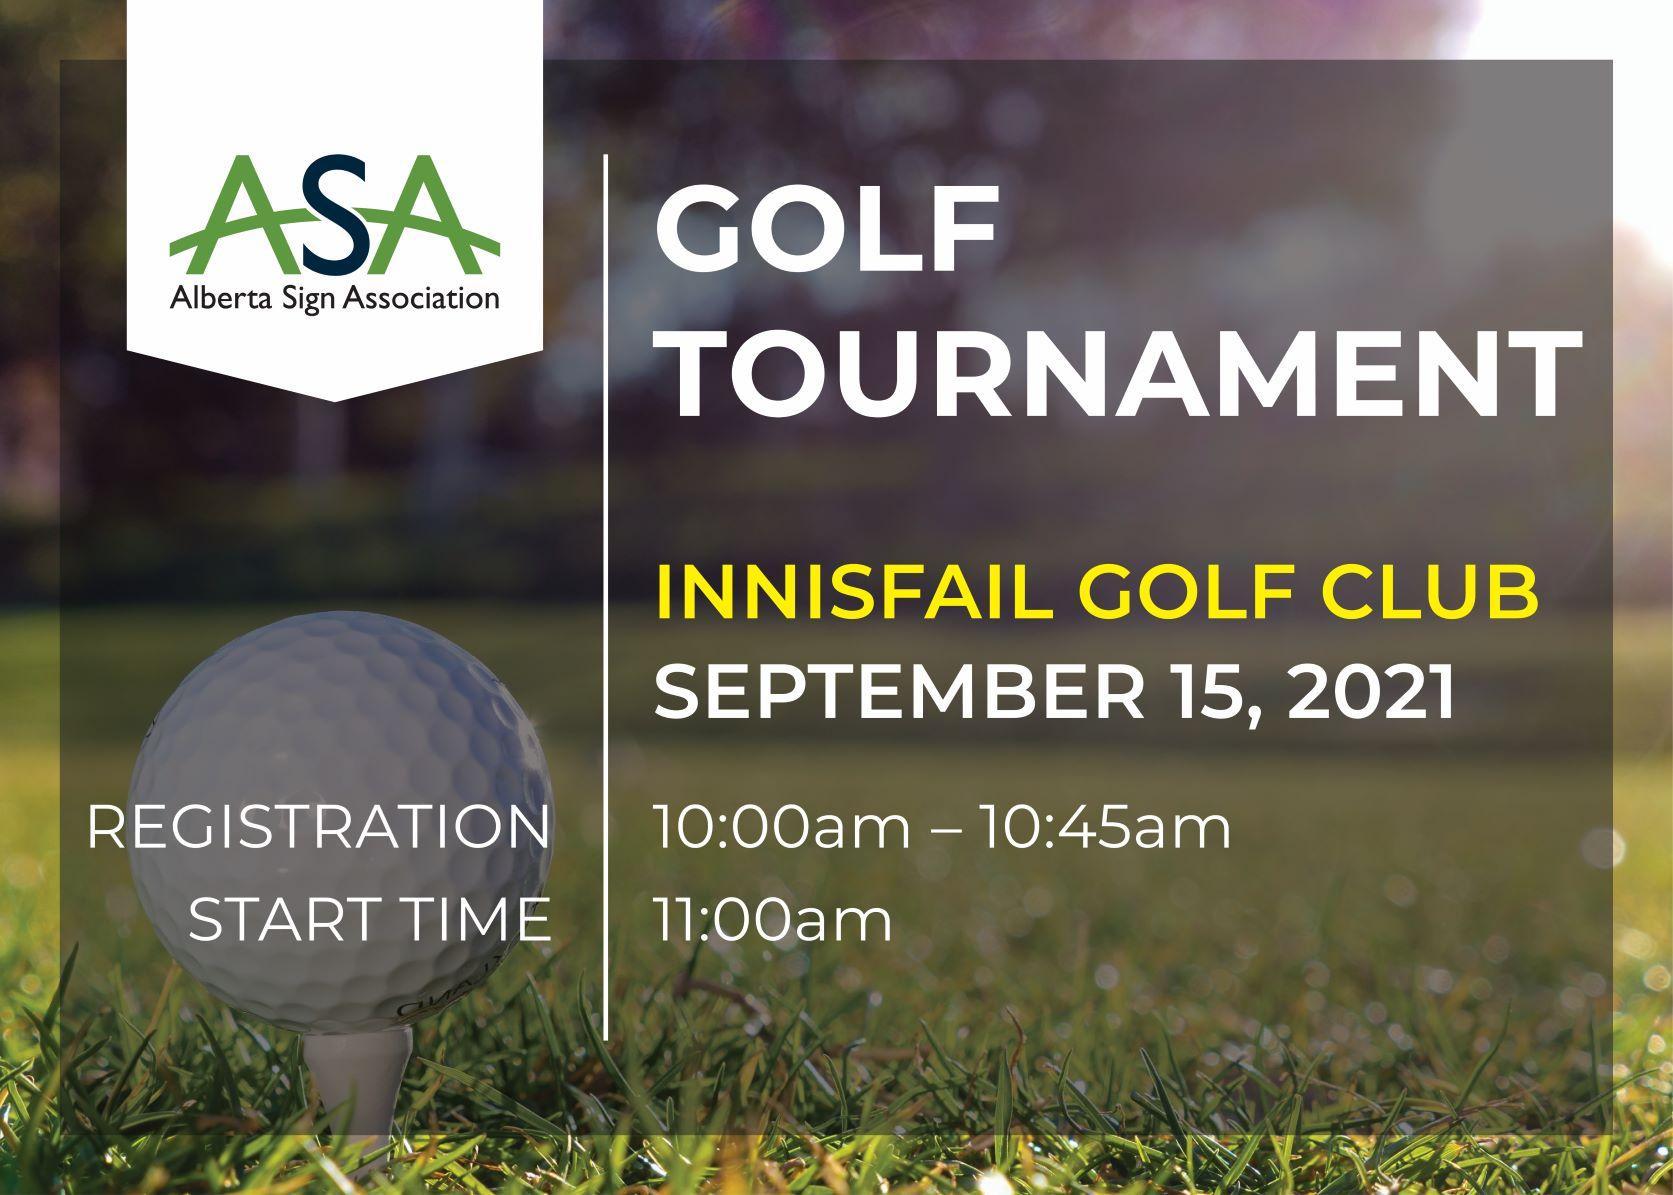 ASA 2021 Golf Tournament